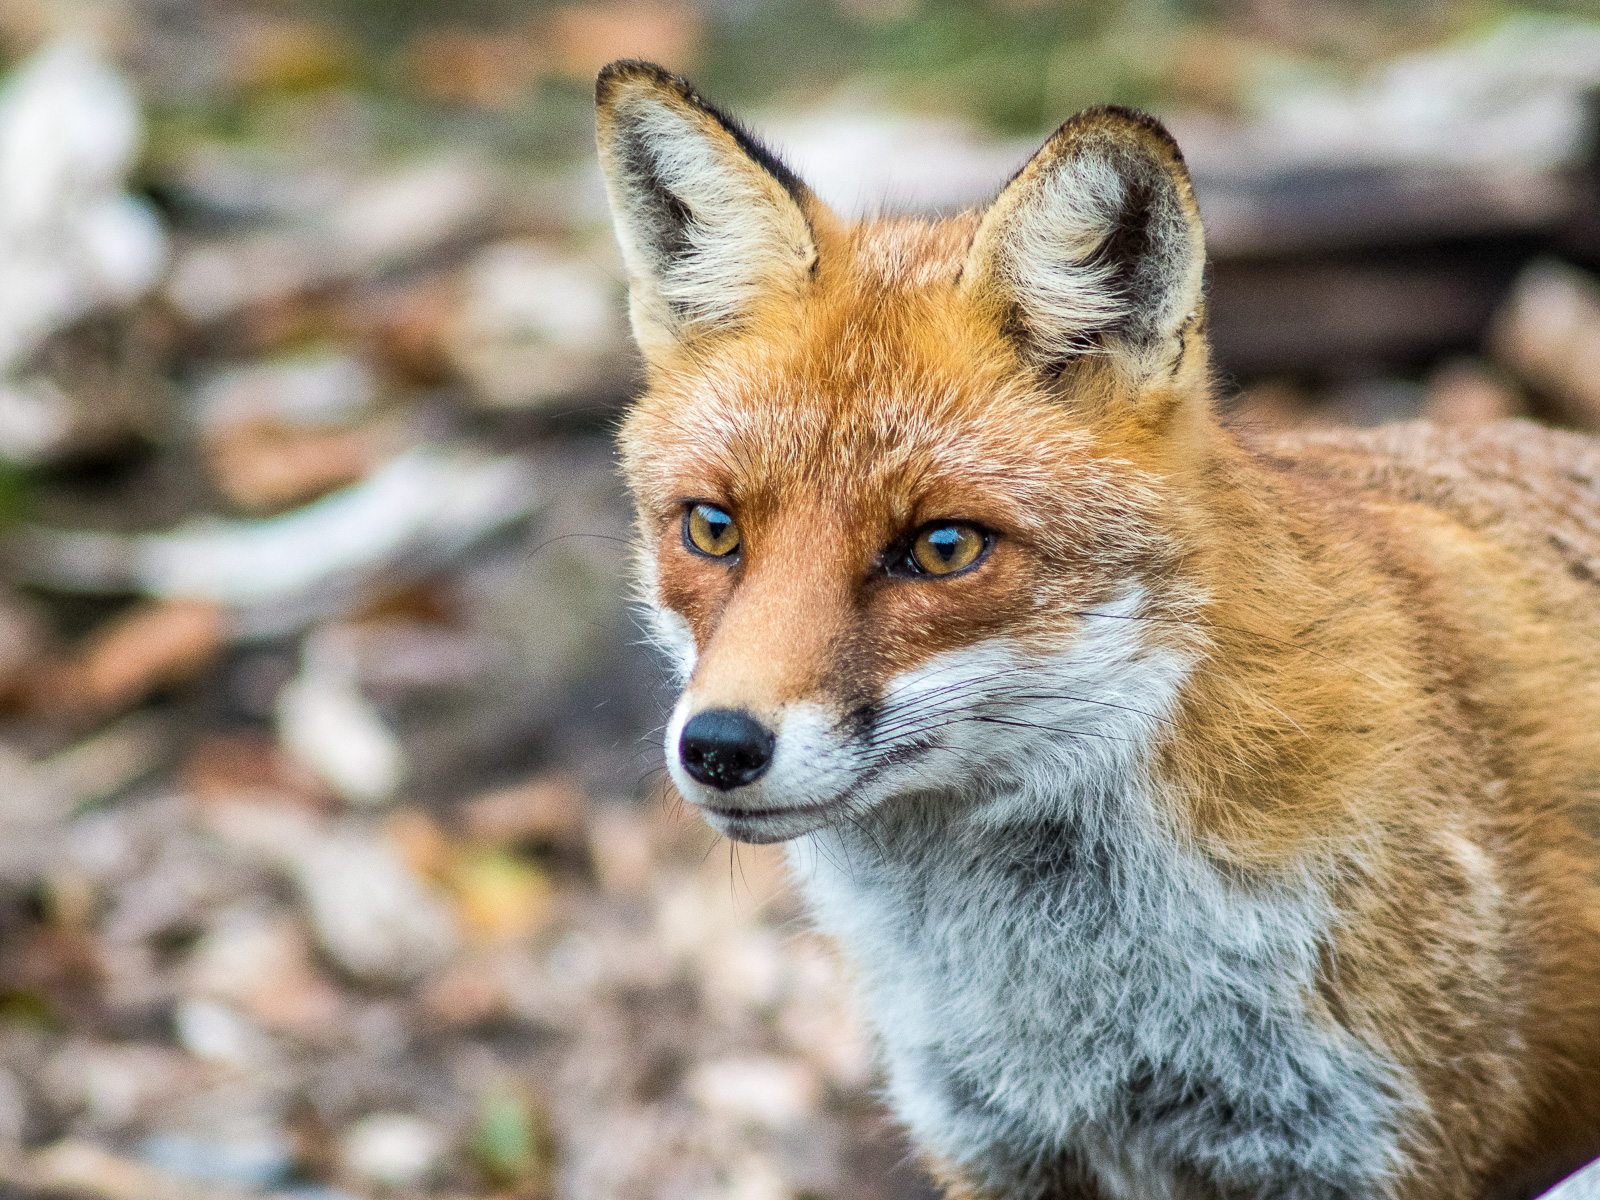 Fuchs am Darßer Weststrand, Portrait fast frontal